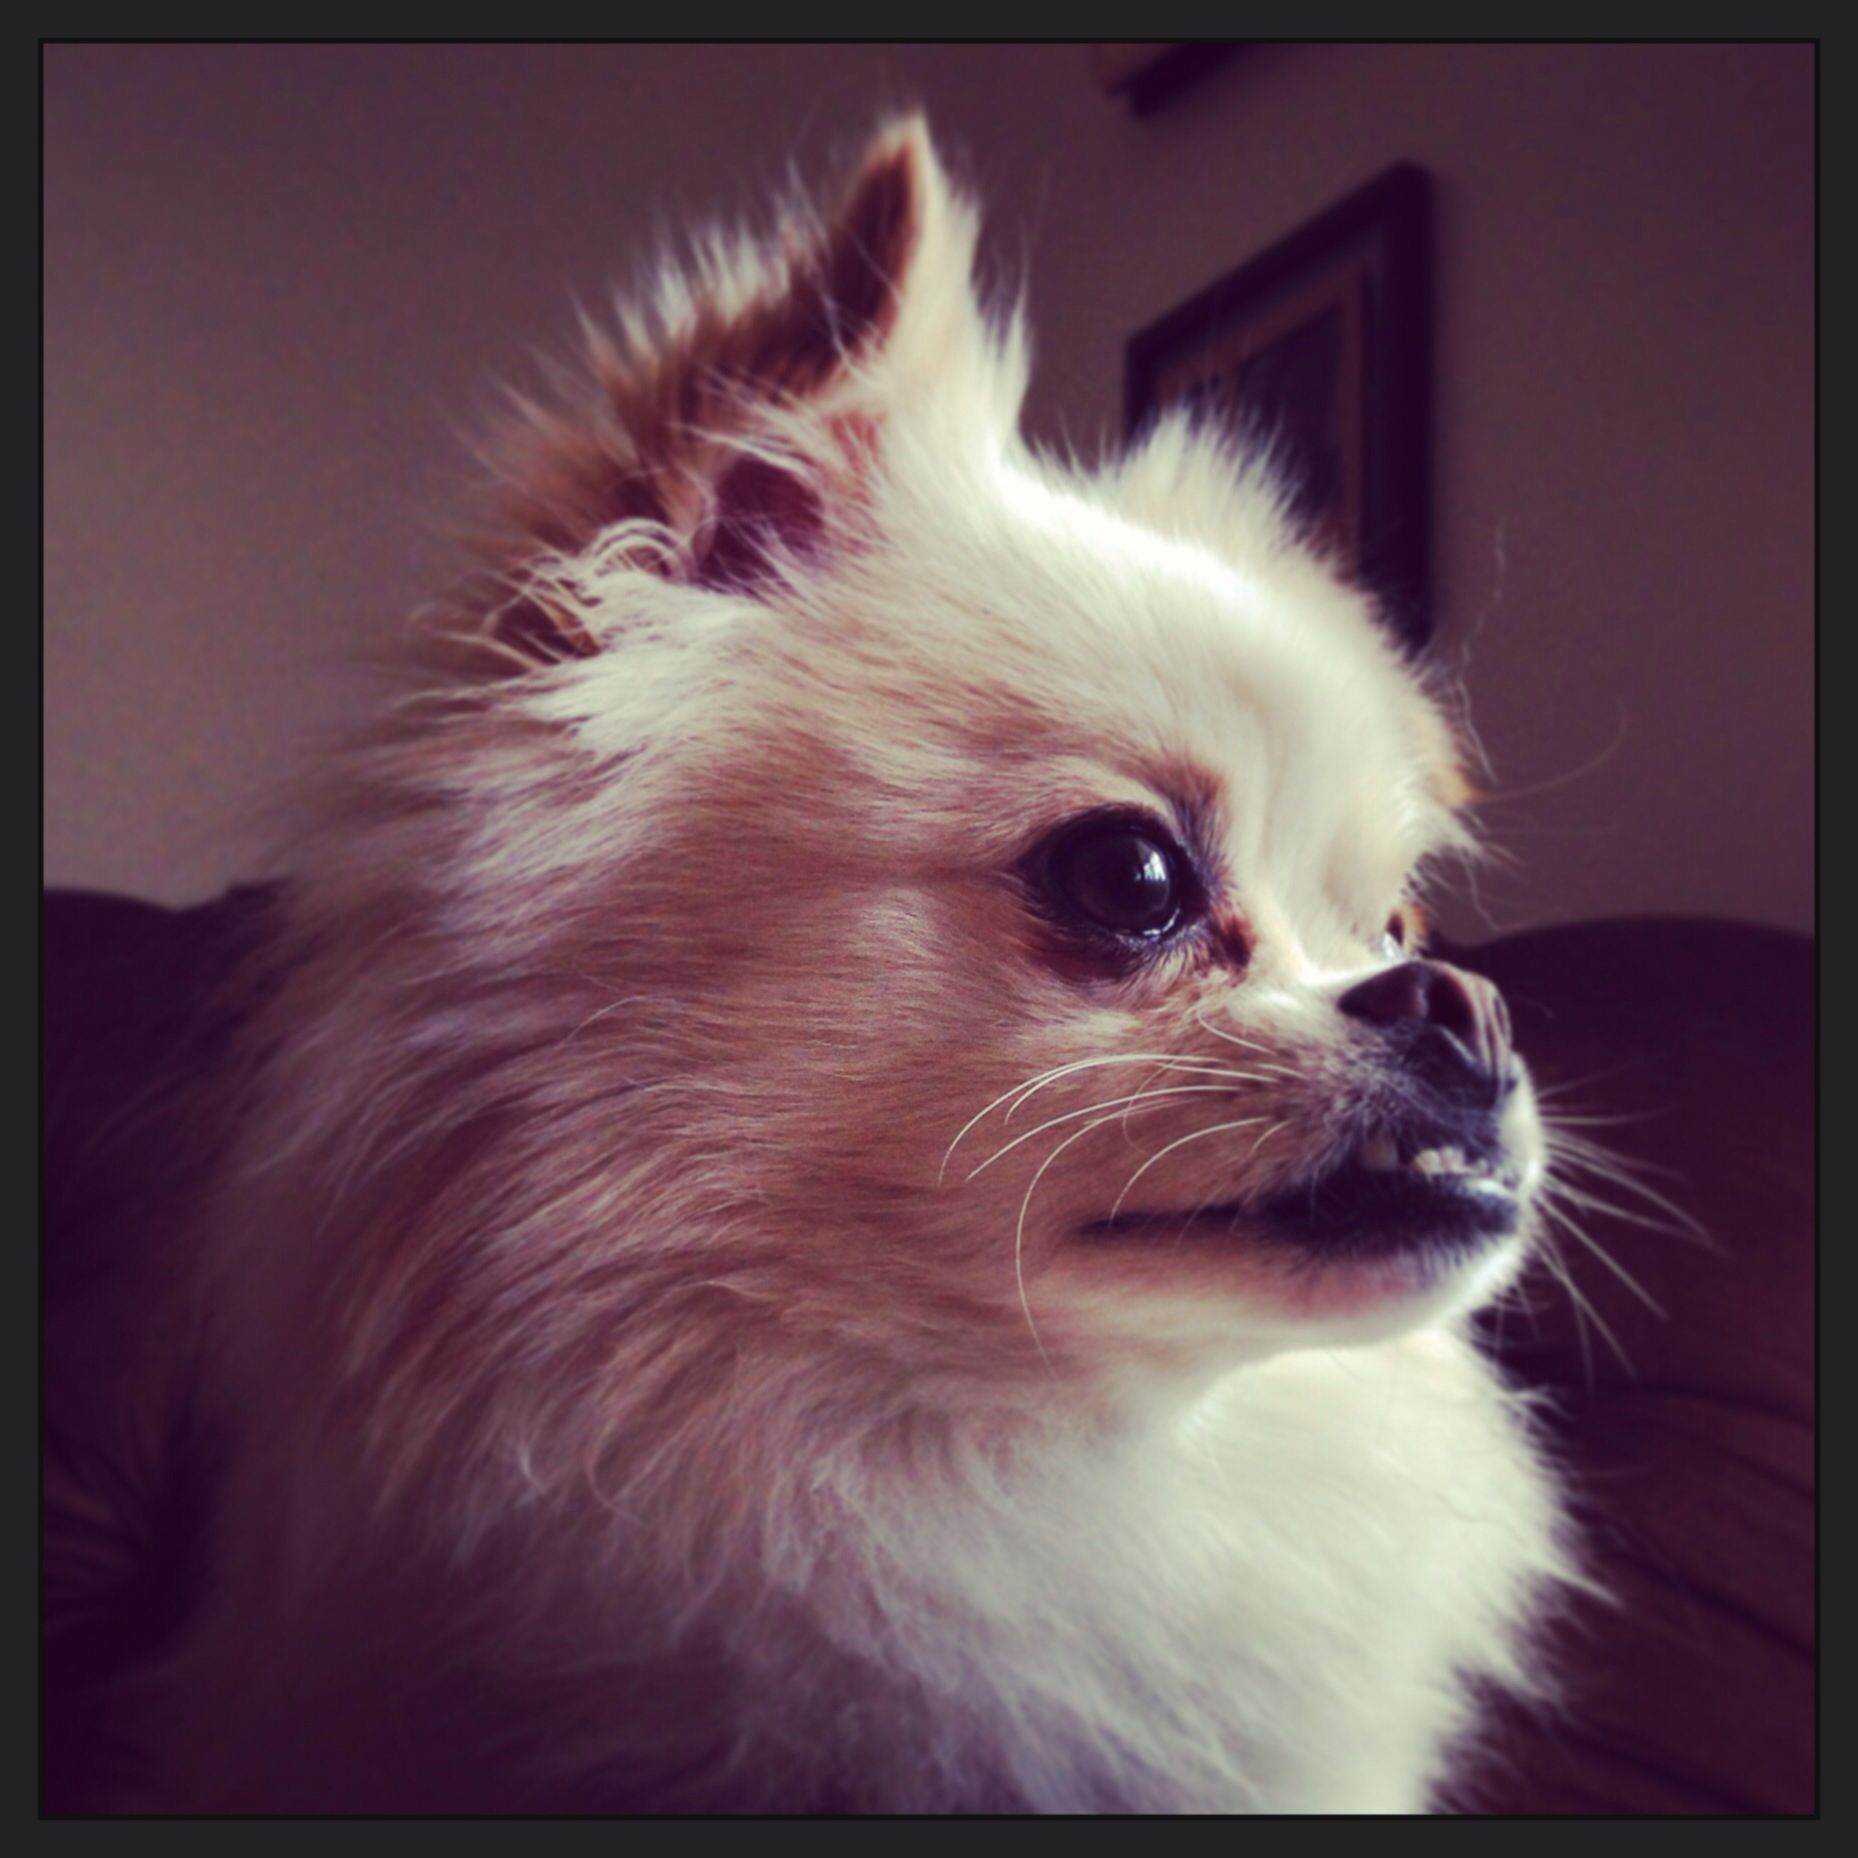 My Adorable Pomeranian Otto And His Cute Underbite Pomeranian